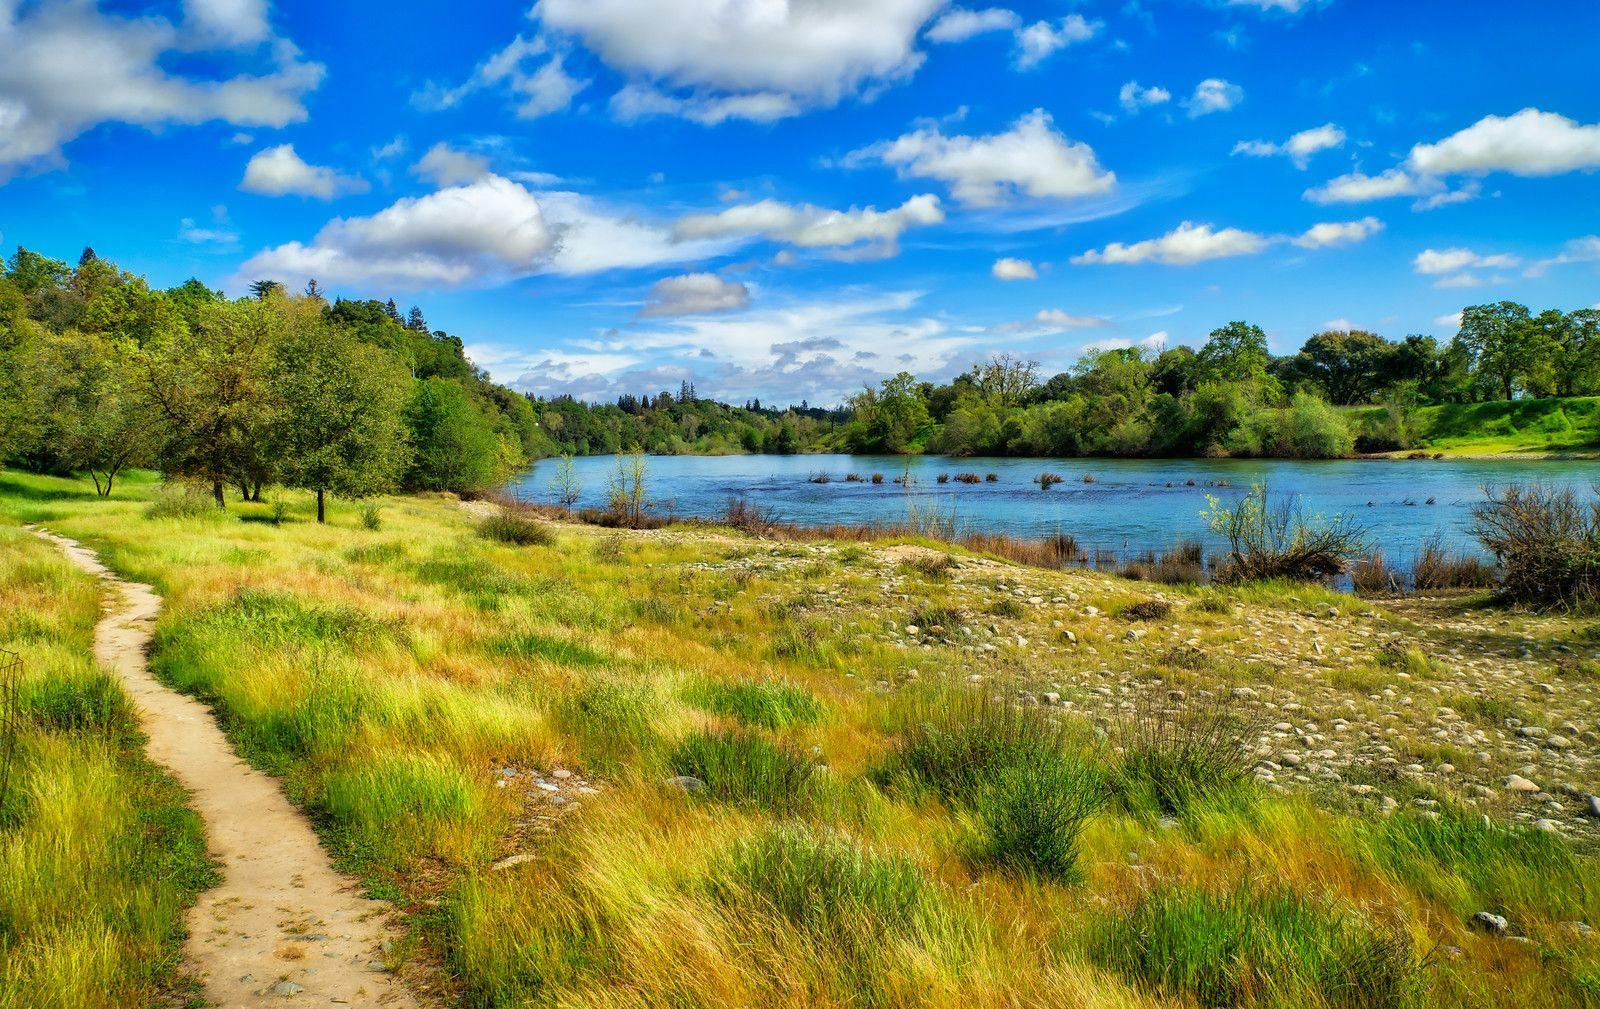 American river parkway jeff driscoll nature preserve